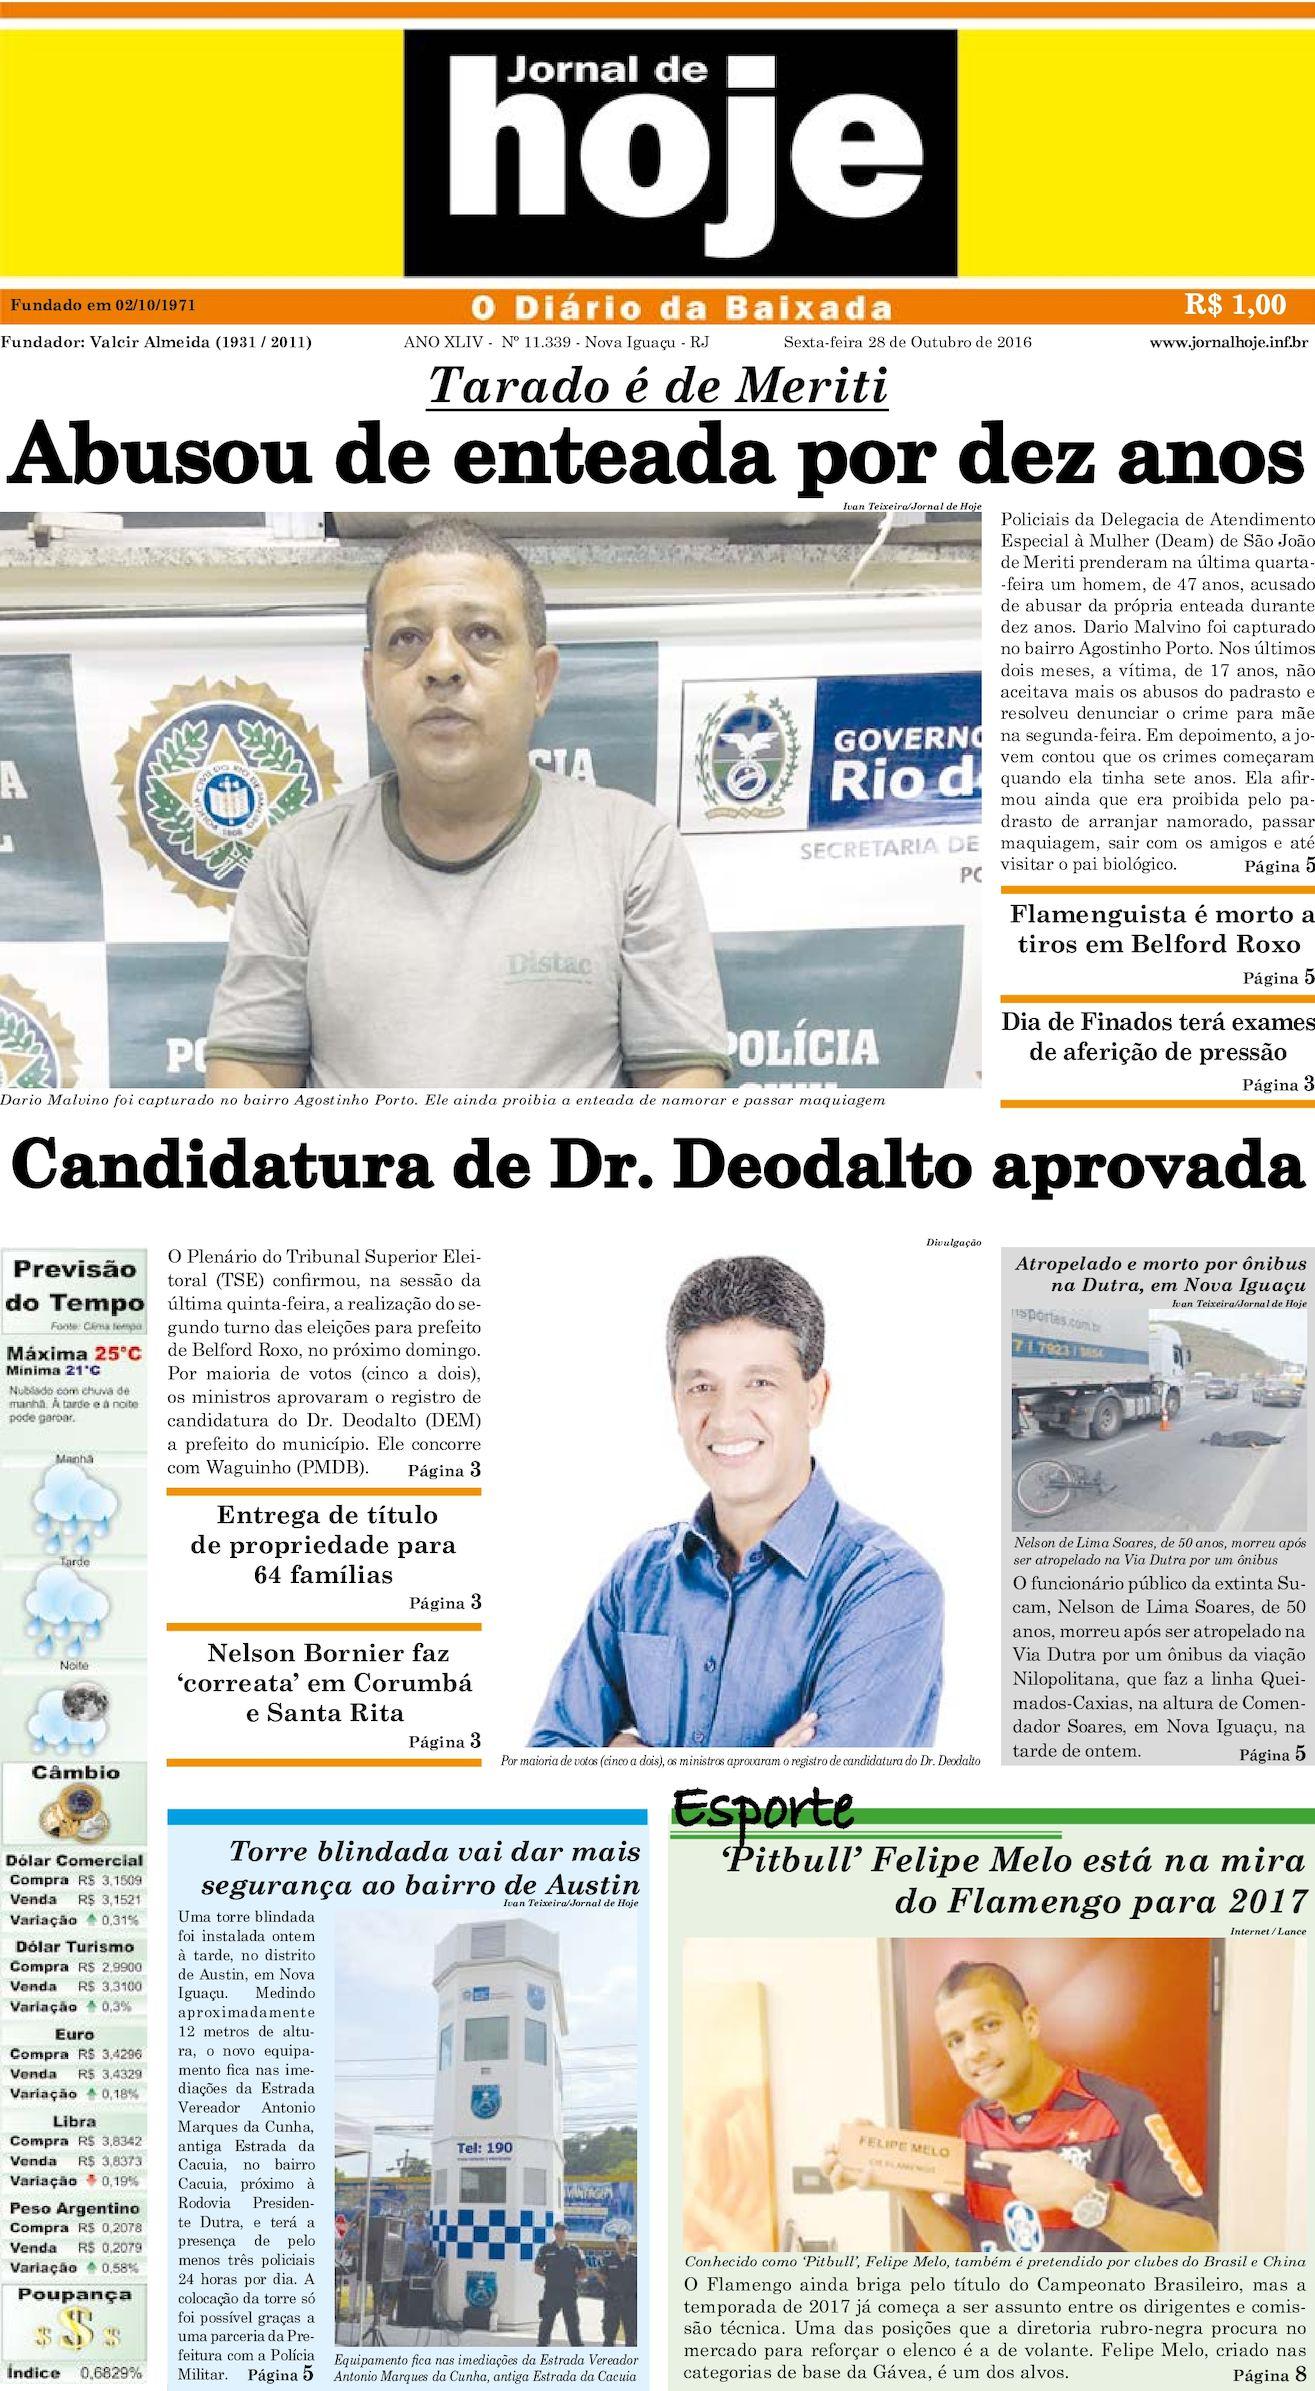 Calaméo - Jornal De Hoje 281016 9b48a636ded68